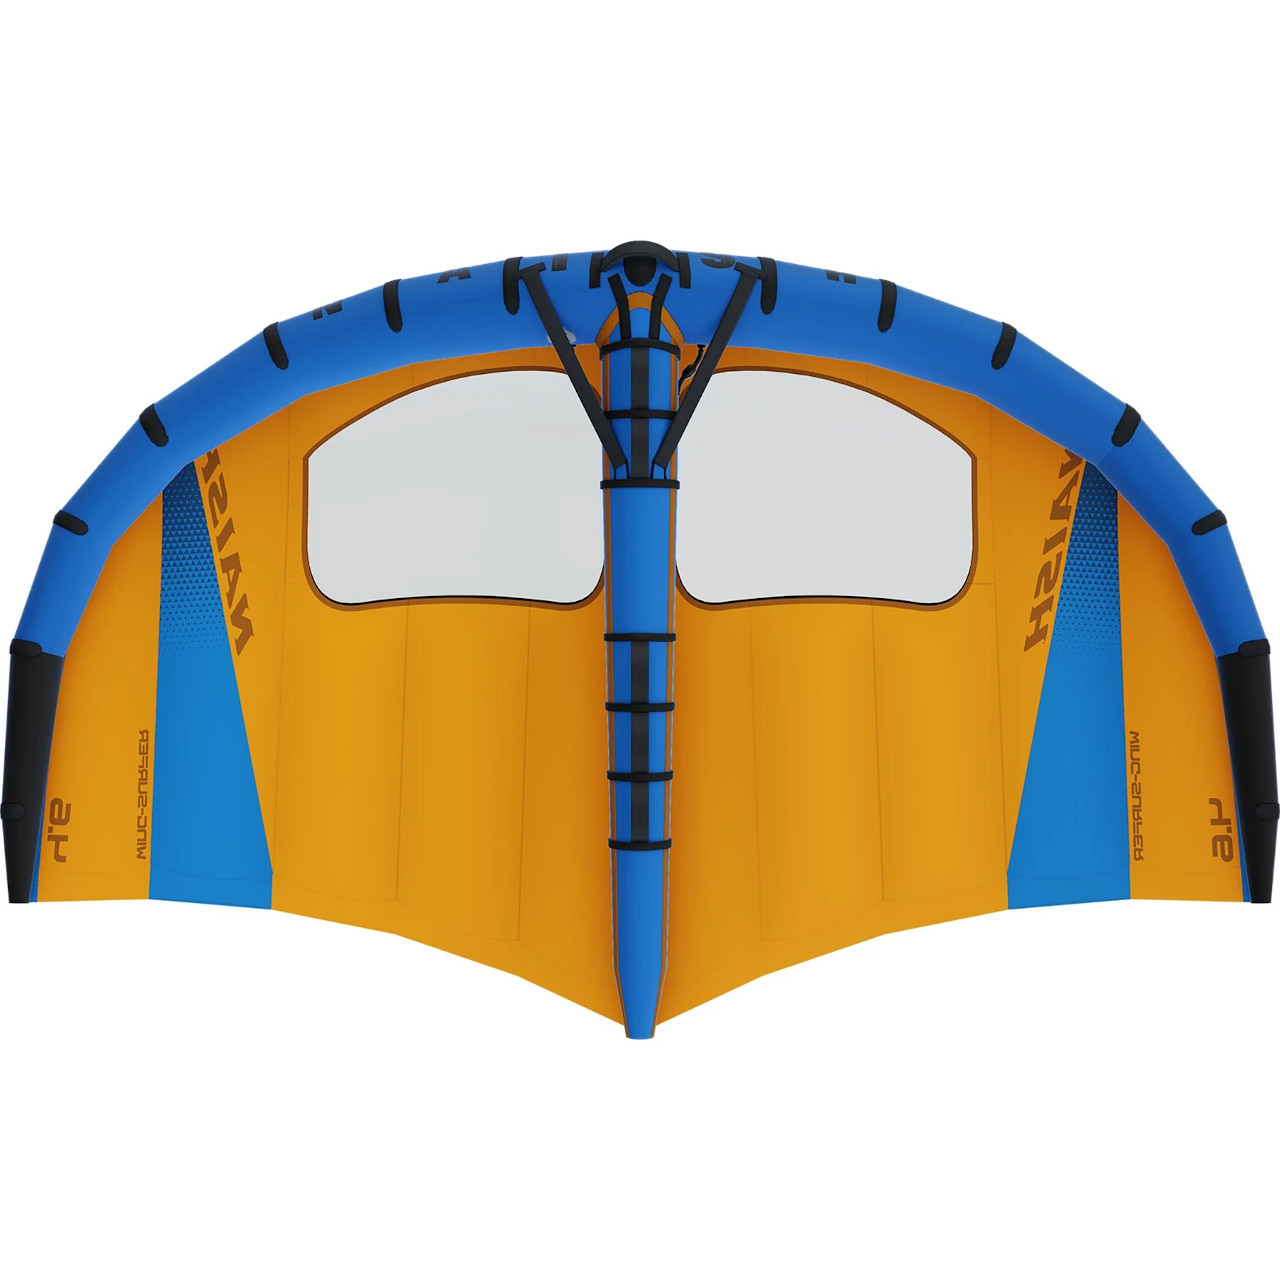 Naish S26 Wing Surfer - bottom orange